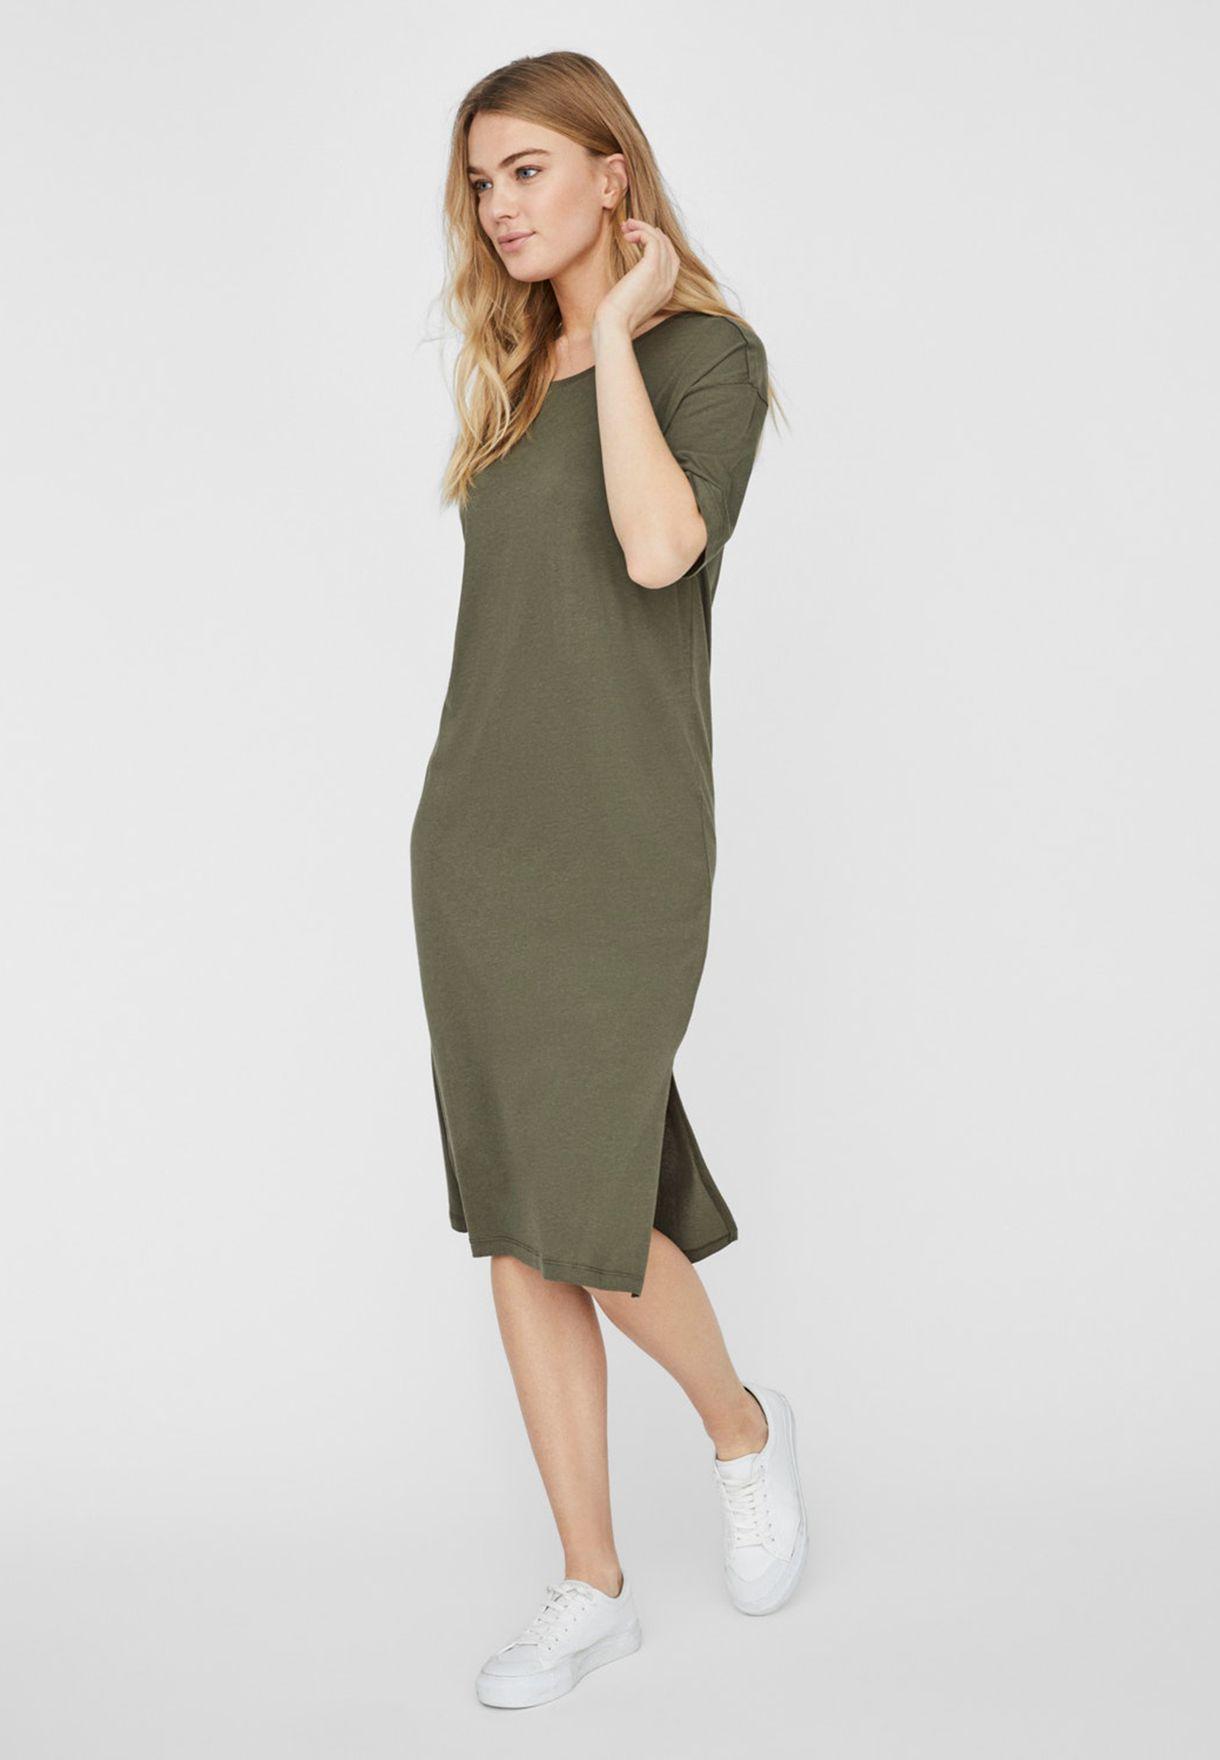 فستان بشقين جانبيين واكمام قصيرة